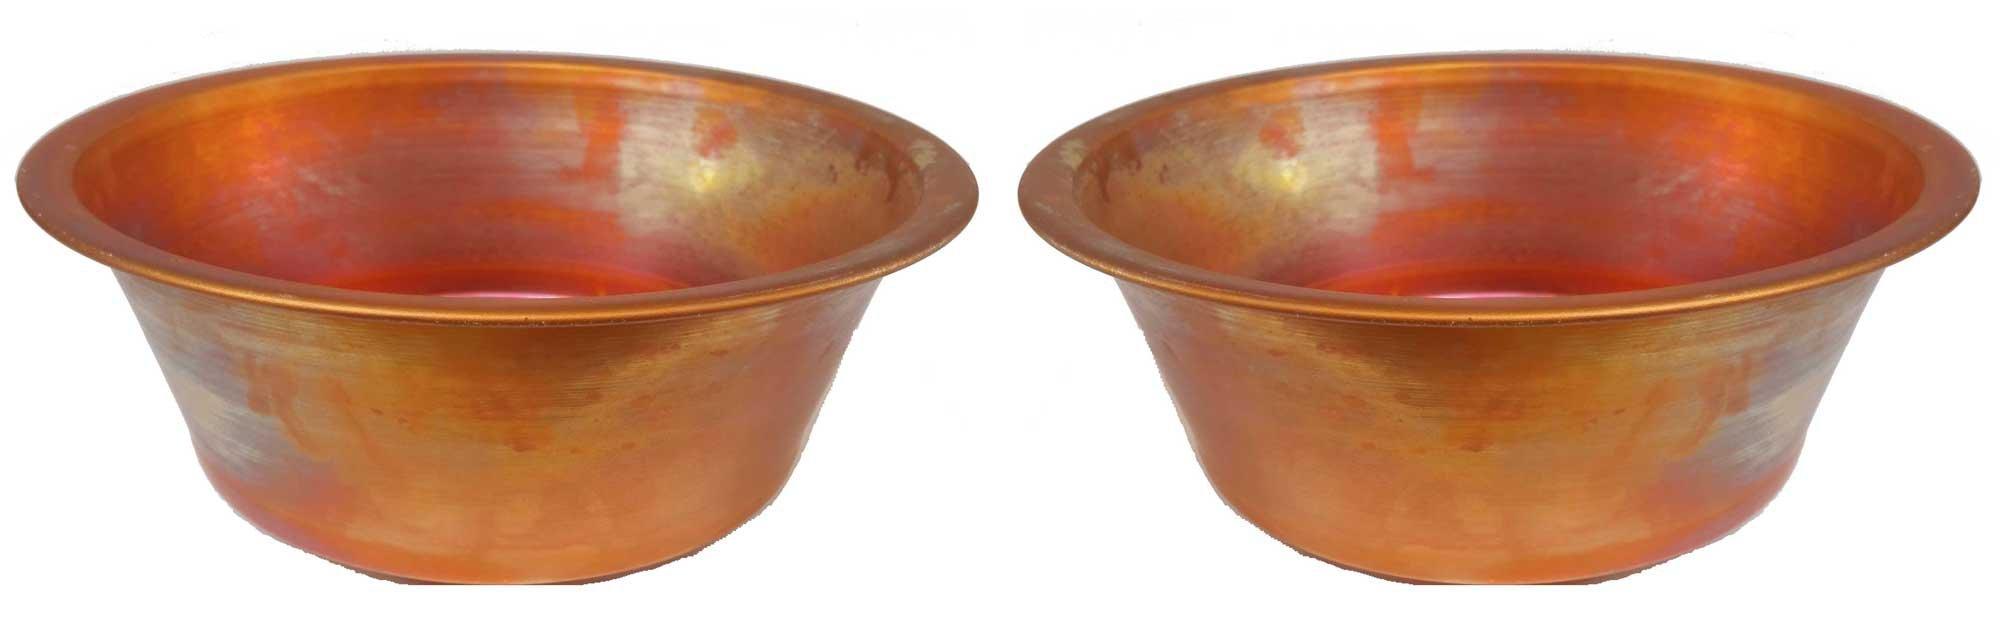 Egypt gift shops Pair SMALL HANDMADE Vessel 11'' Copper Pan Panning Bowls Basins Toilet Bathroom Sinks Wholesale